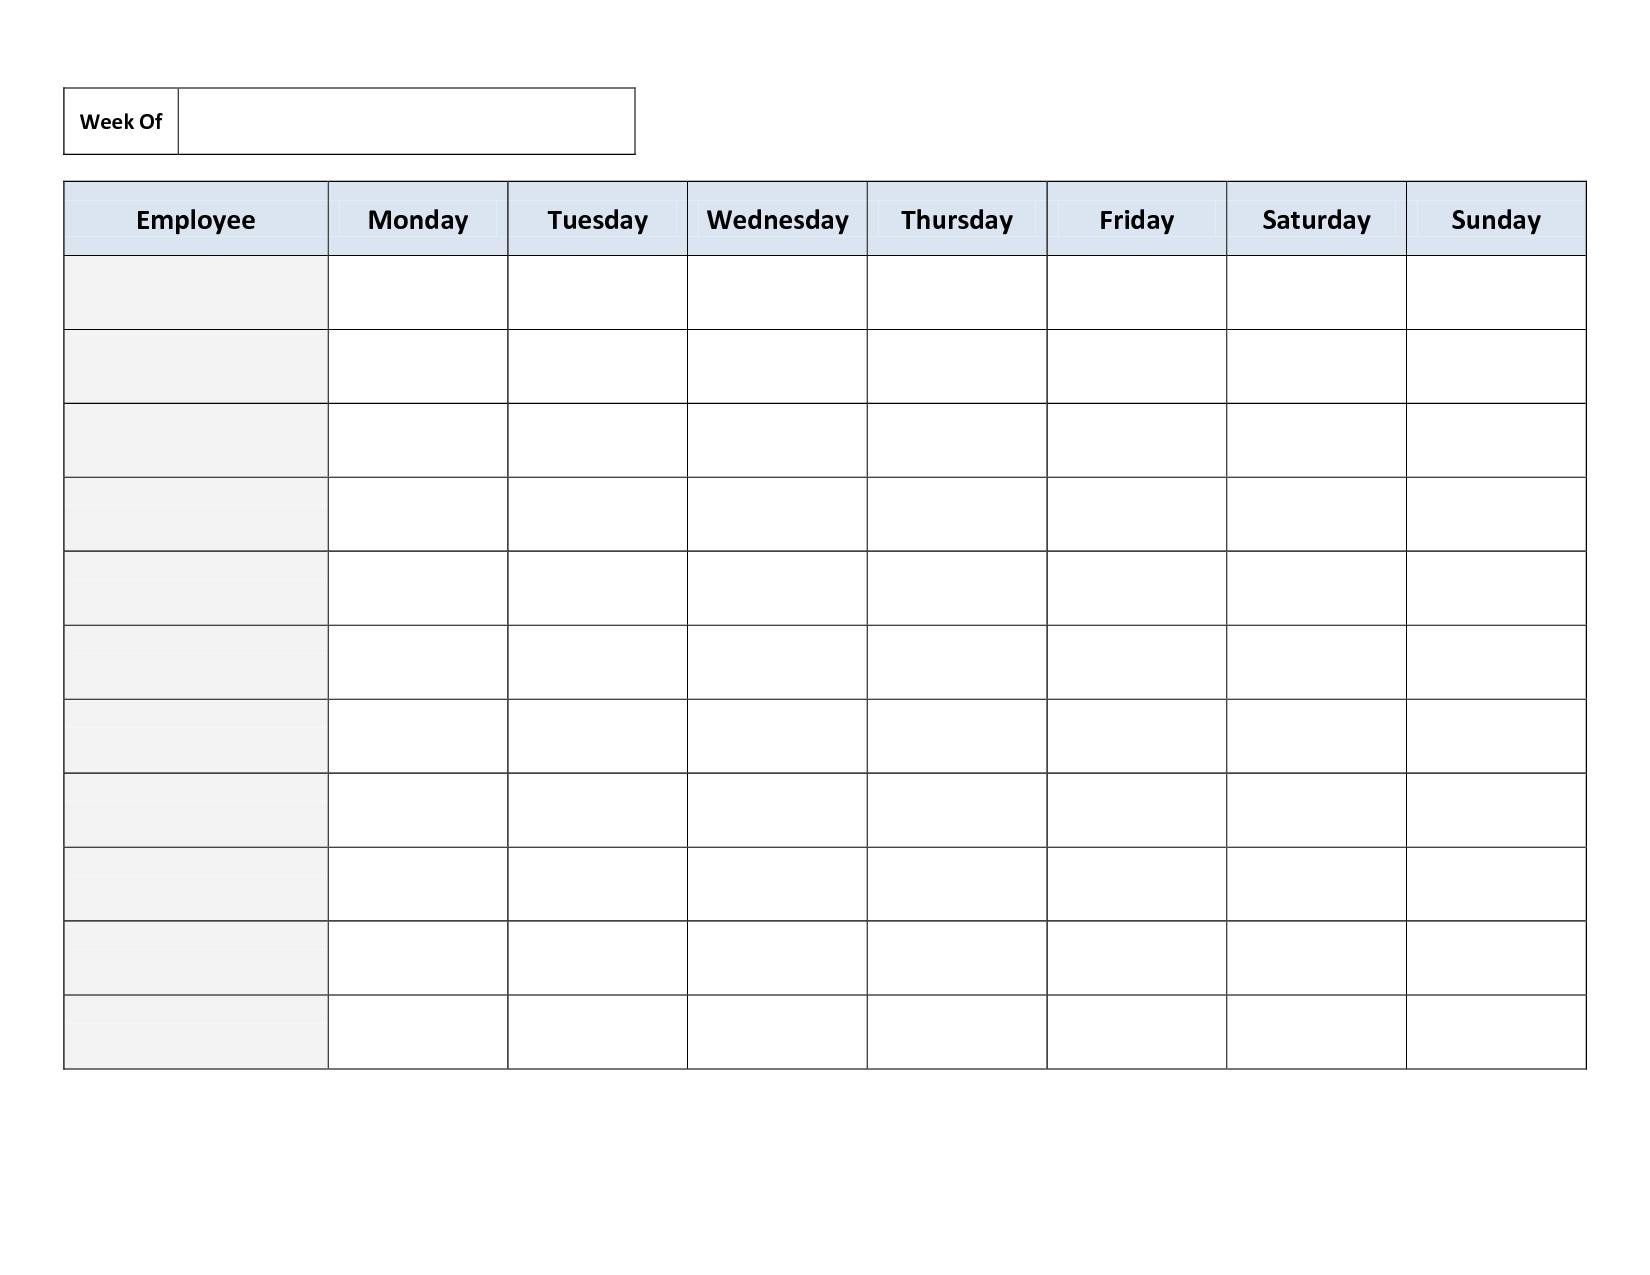 Blank Weekly Work Schedule Template | Schedule | Cleaning Schedule - Free Printable Blank Weekly Schedule